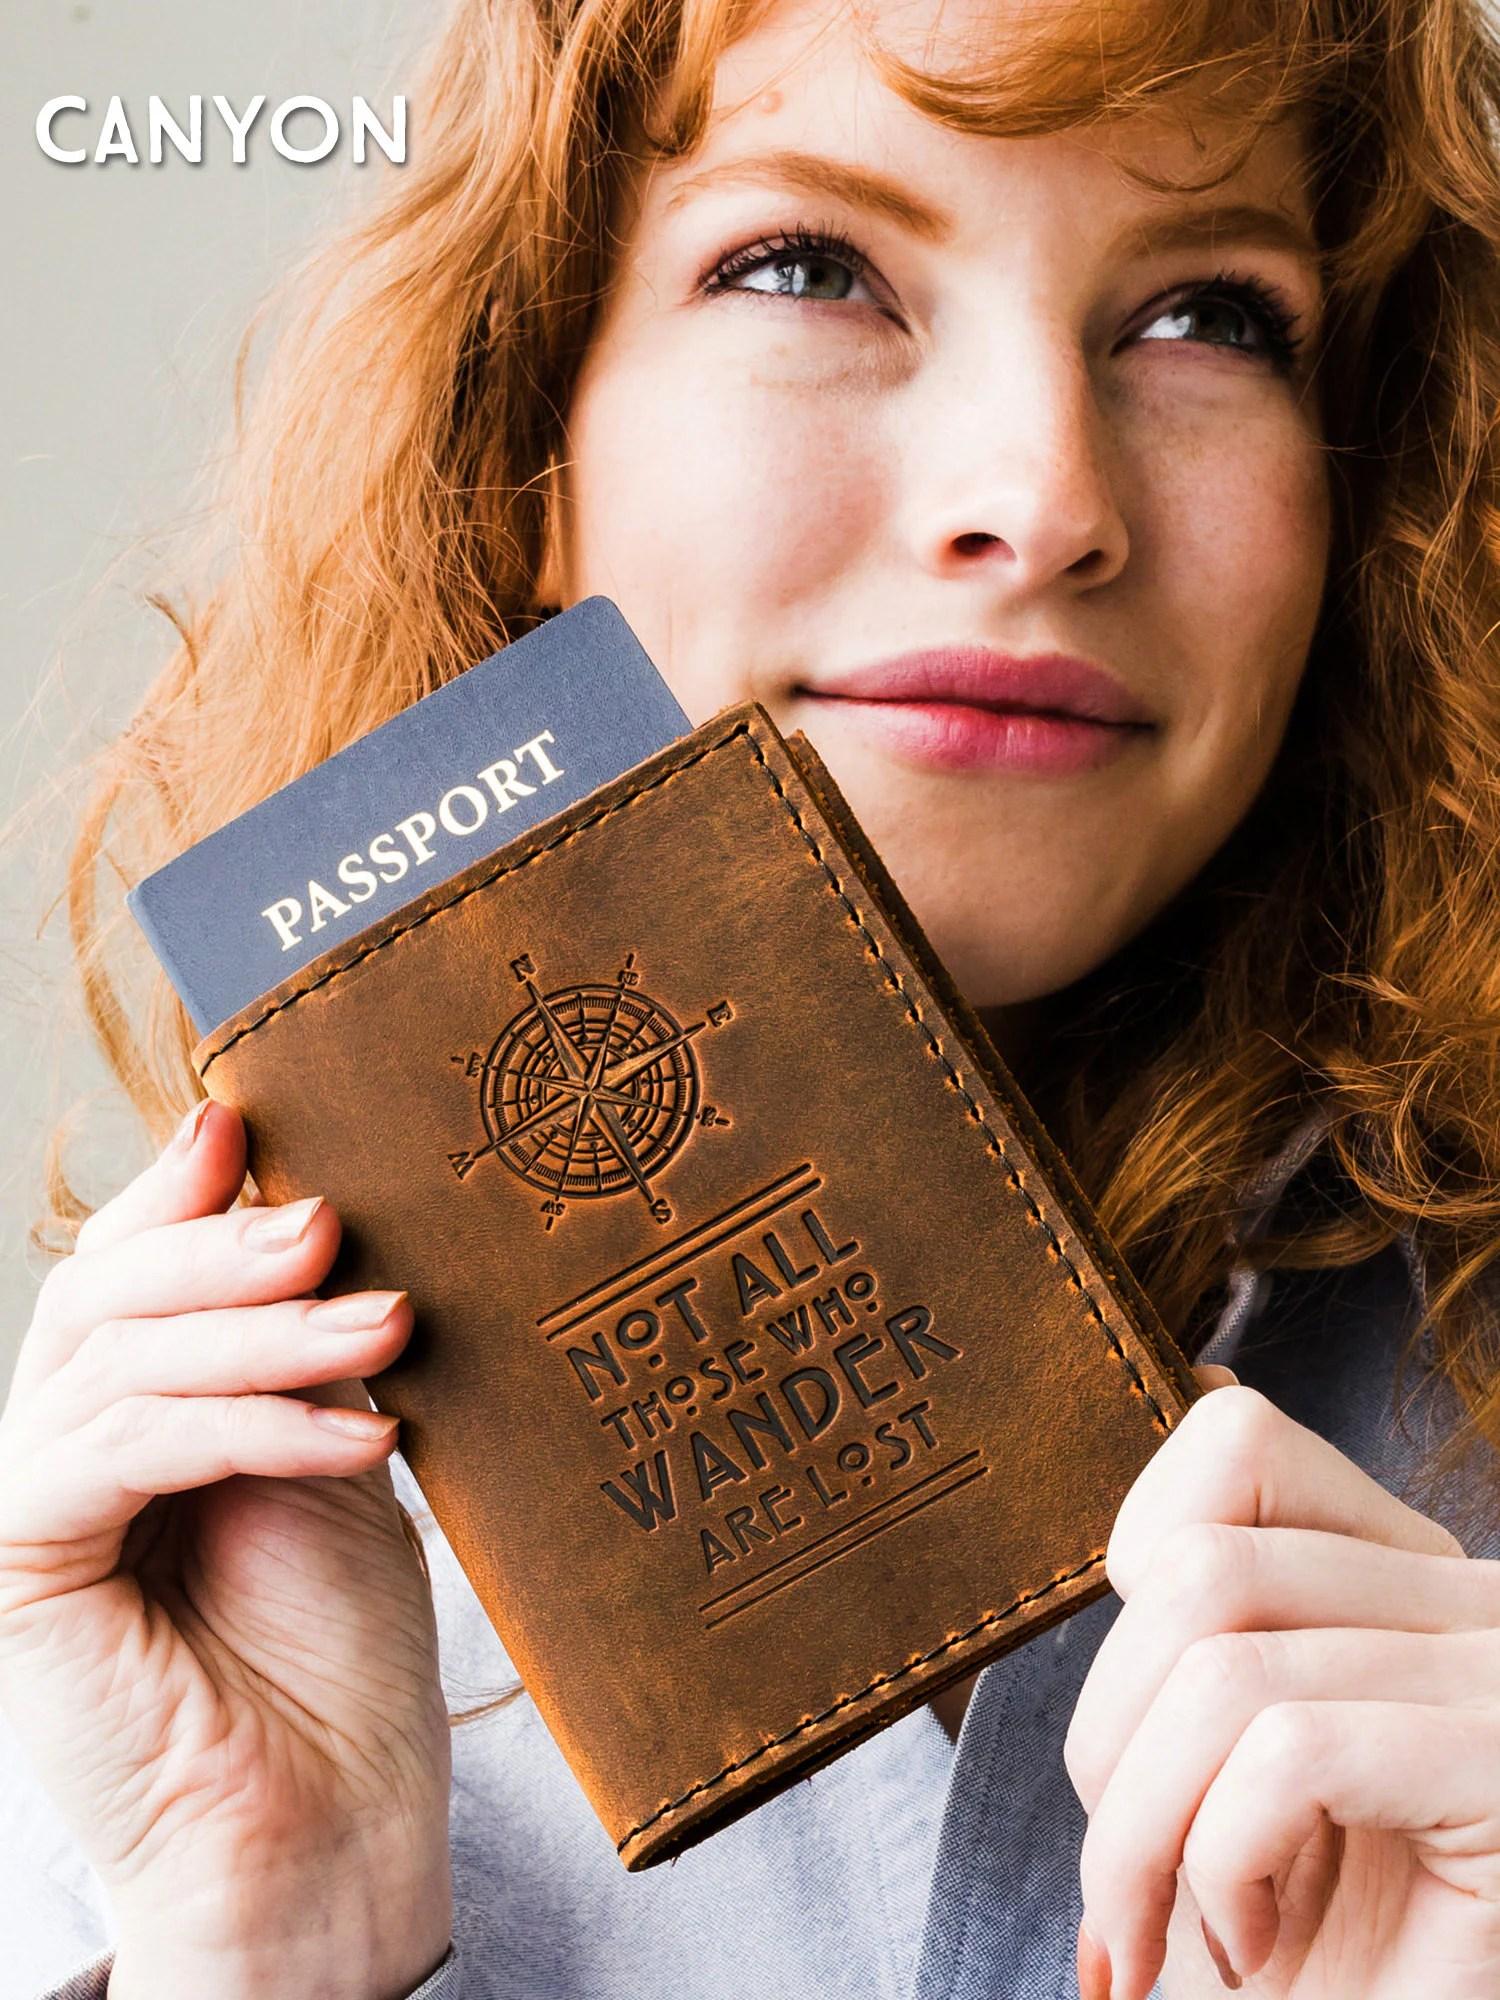 Passport Cover Travel Passport Personalized Cover... Custom image 8